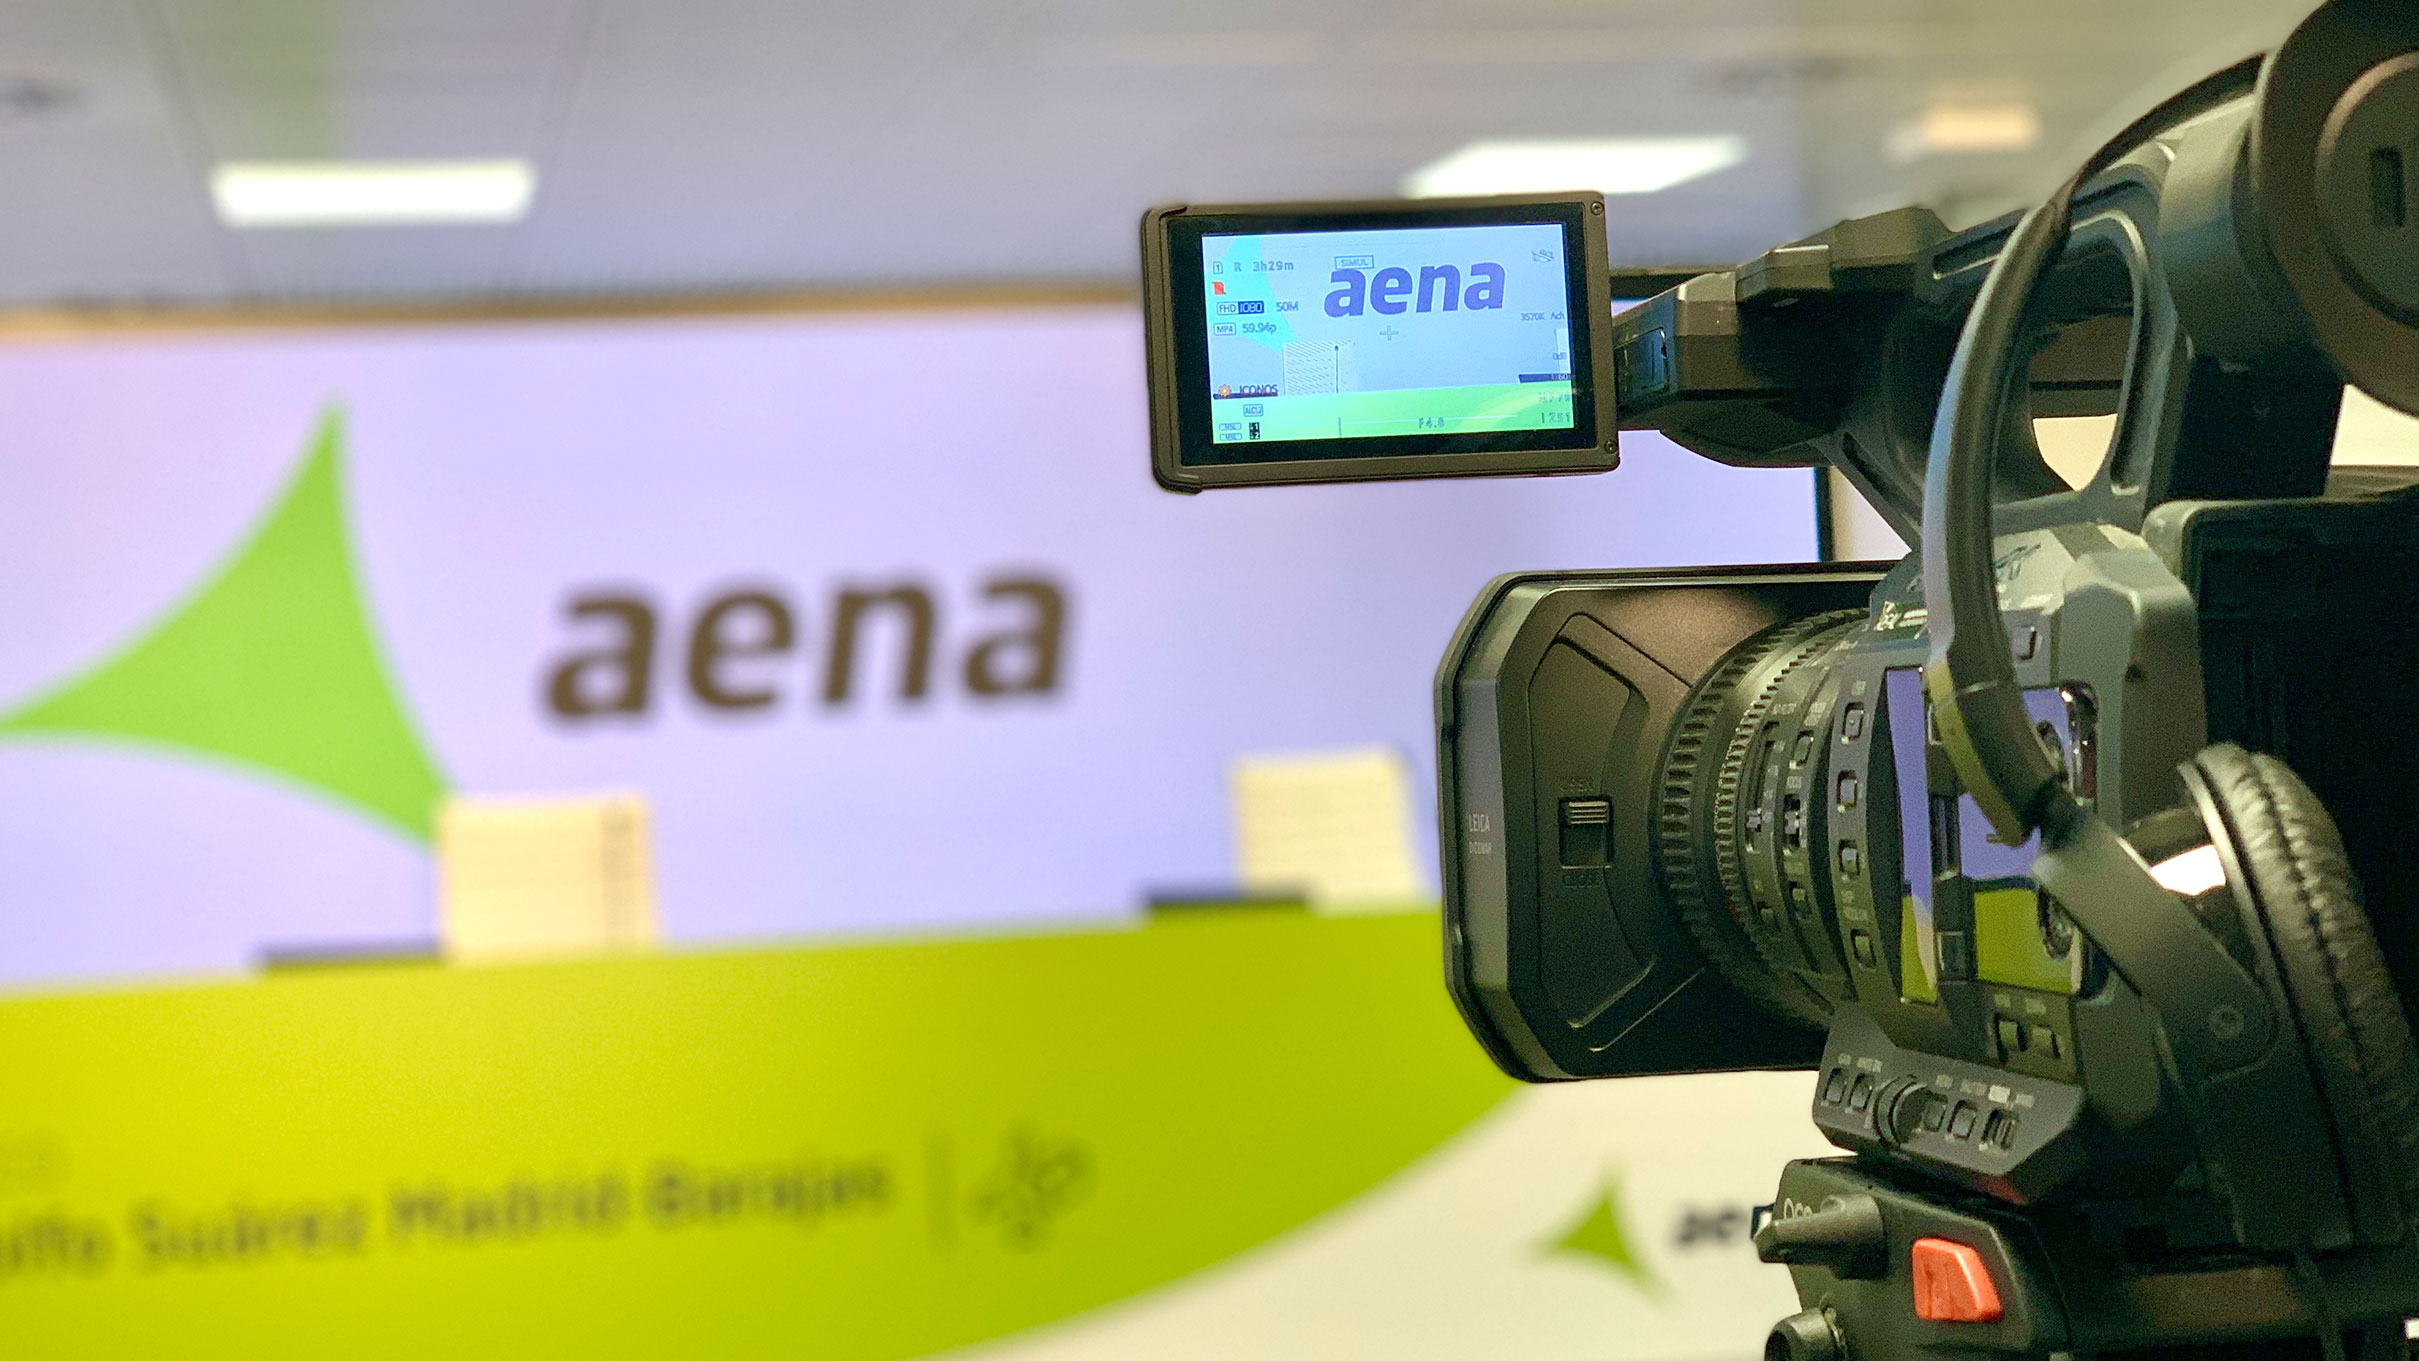 aena-airportcity-barajas-2021_03